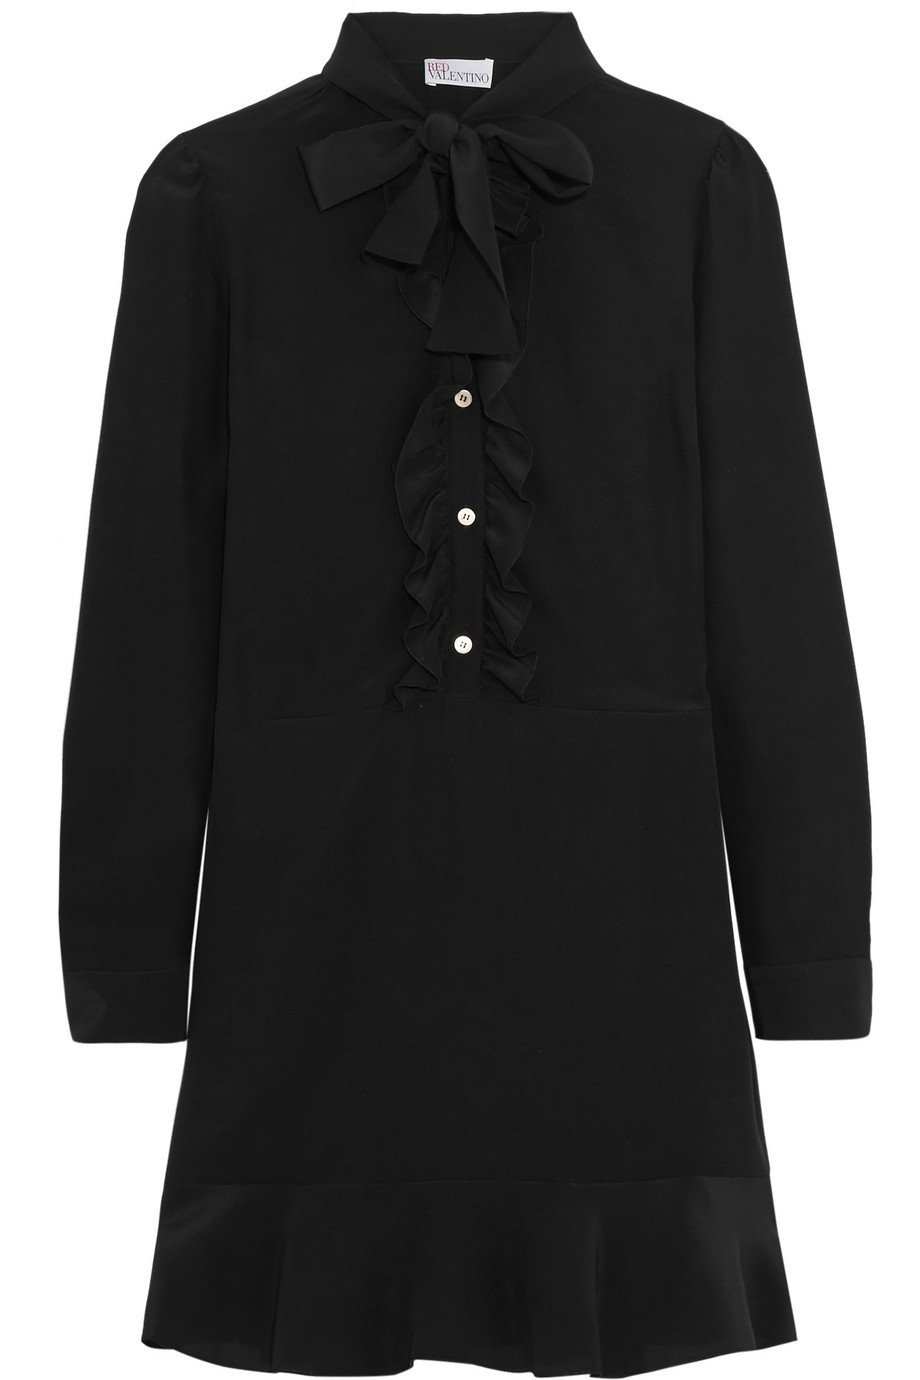 Redvalentino Ruffled Pussy-Bow Silk Crepe De Chine Mini Dress, Black, Women's, Size: 36